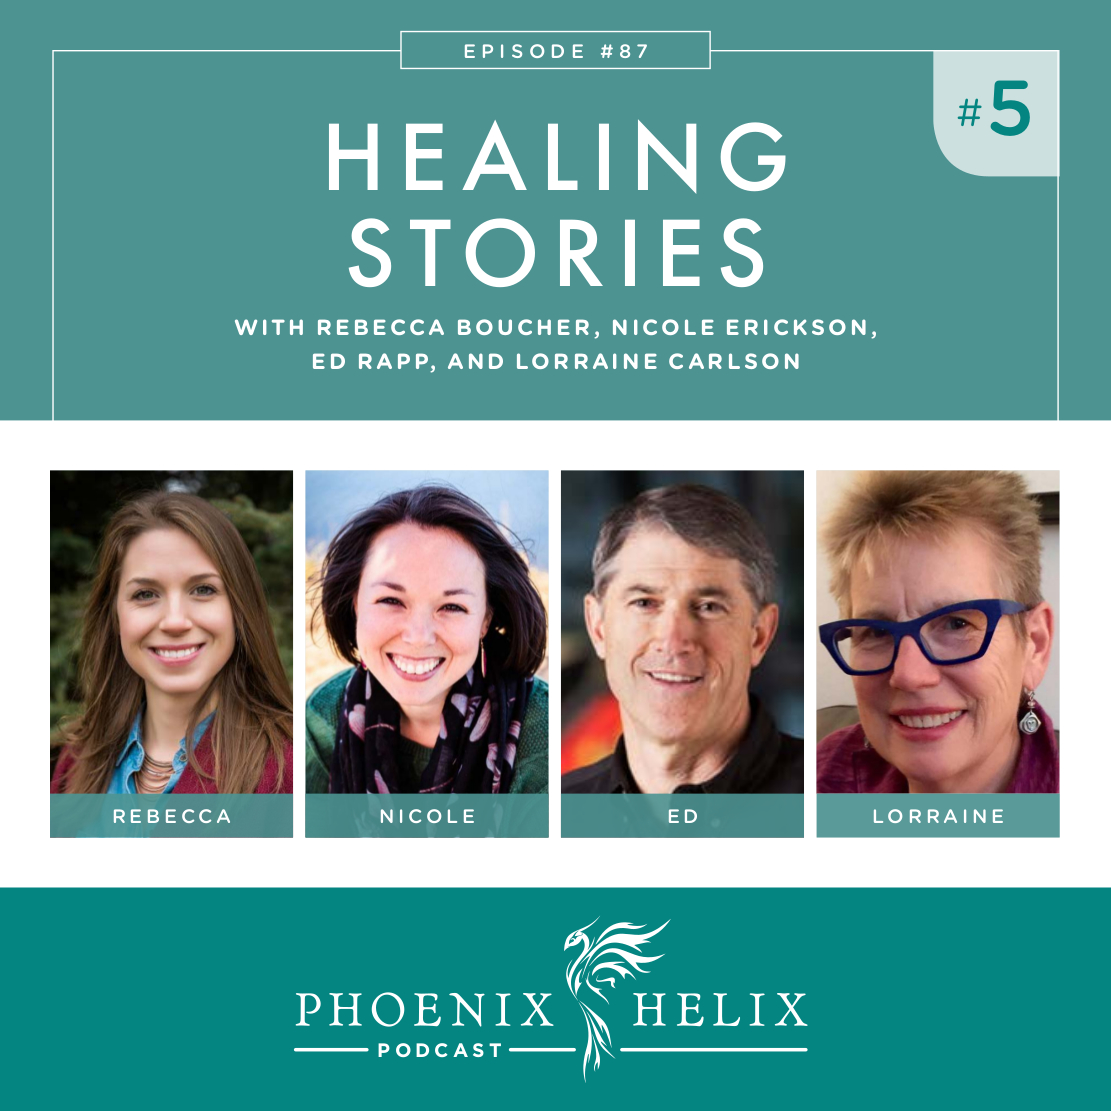 Healing Stories 5 | Phoenix Helix Podcast (Lichen Sclerosus, Ulcerative Colitis, Rheumatoid Arthritis, and ALS)